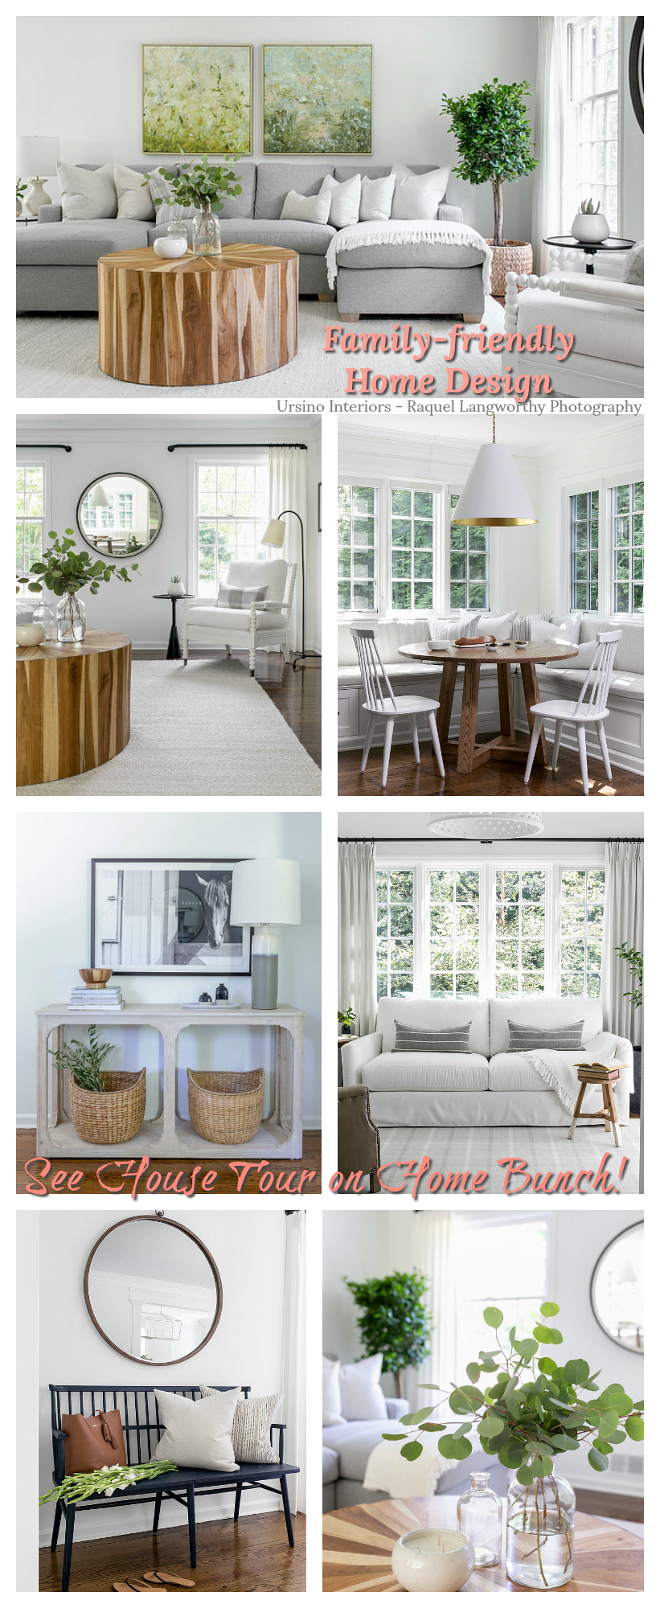 Family-friendly Home Design Family-friendly Home Design Ideas #FamilyfriendlyHome #FamilyfriendlyHomeDesign